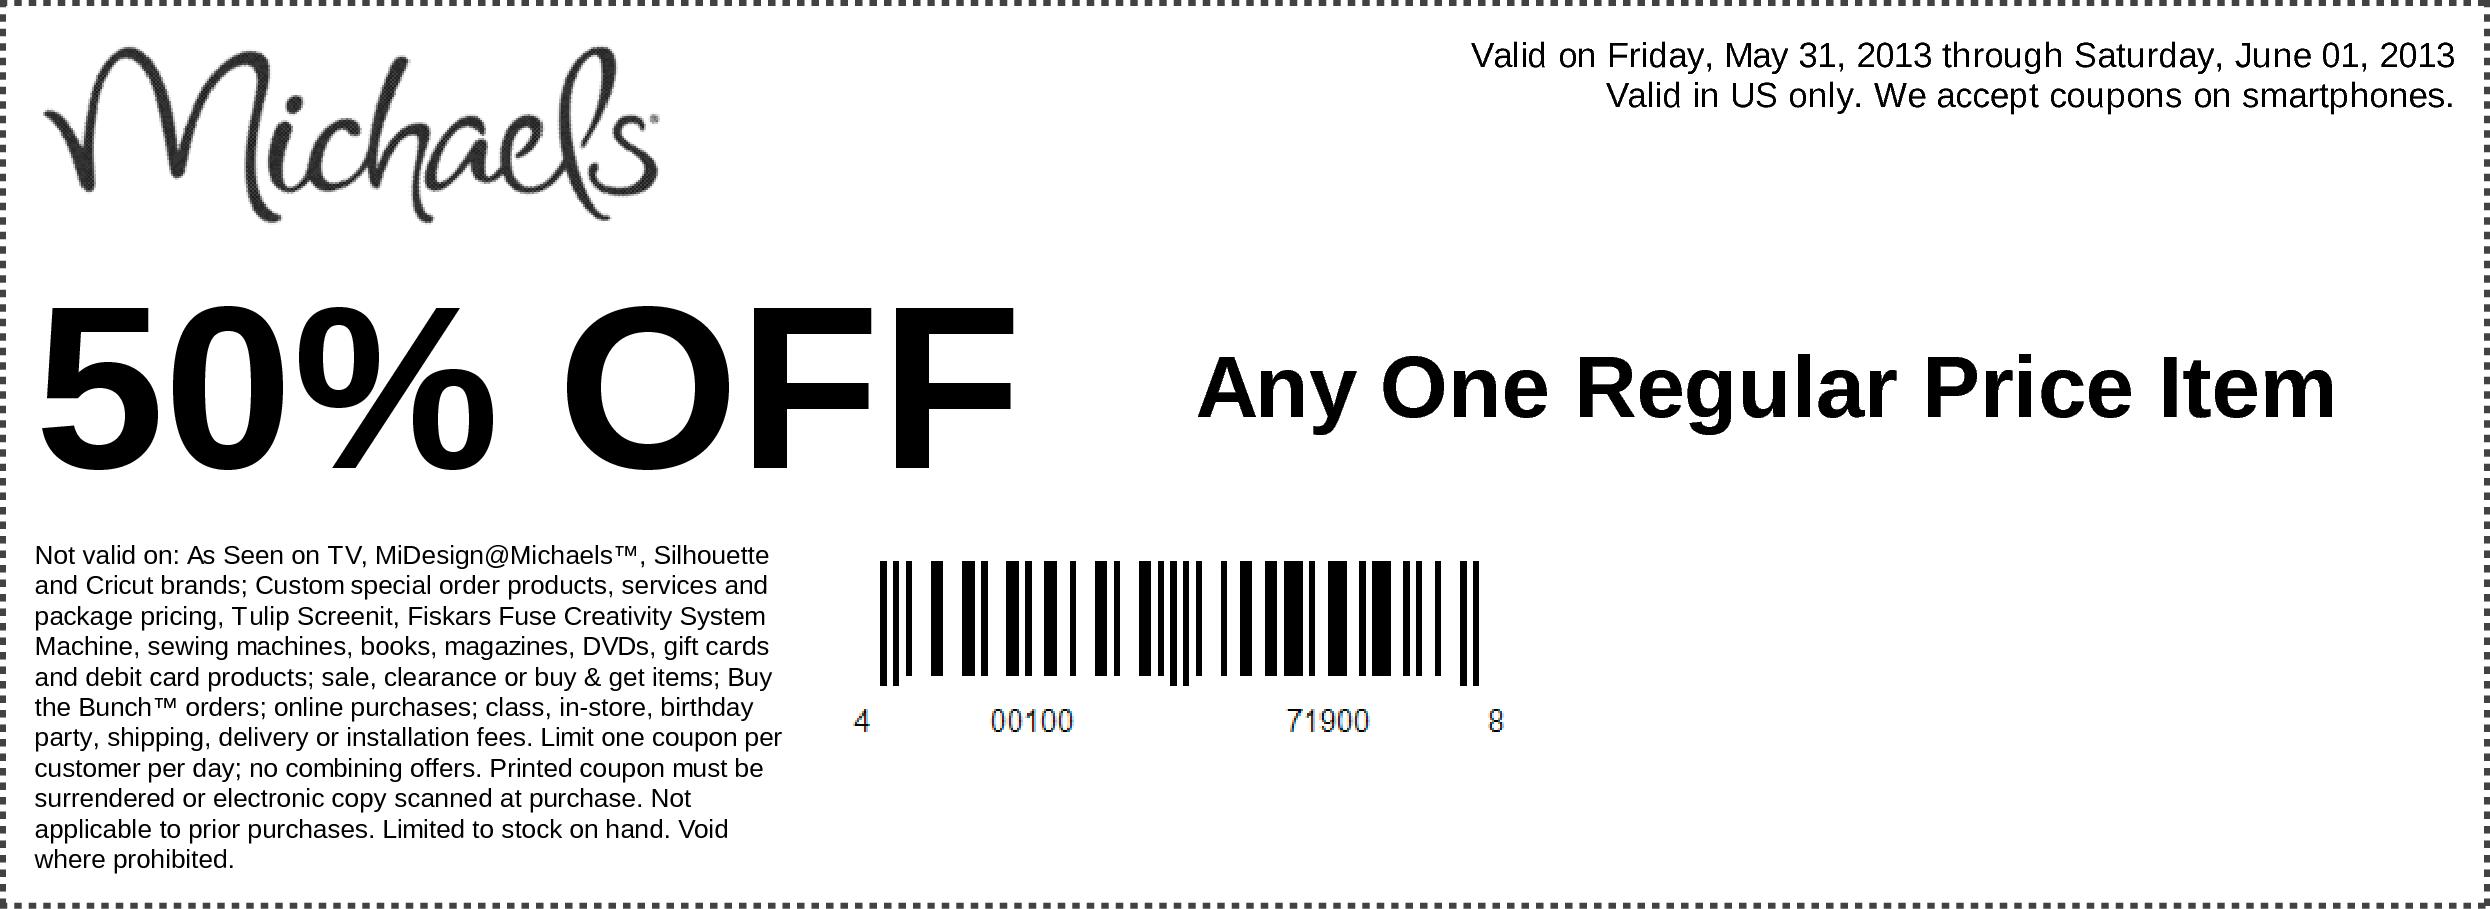 Free-Michaels-Printable-Coupons-2017 – Printable Coupons Online - Free Printable Michaels Coupons